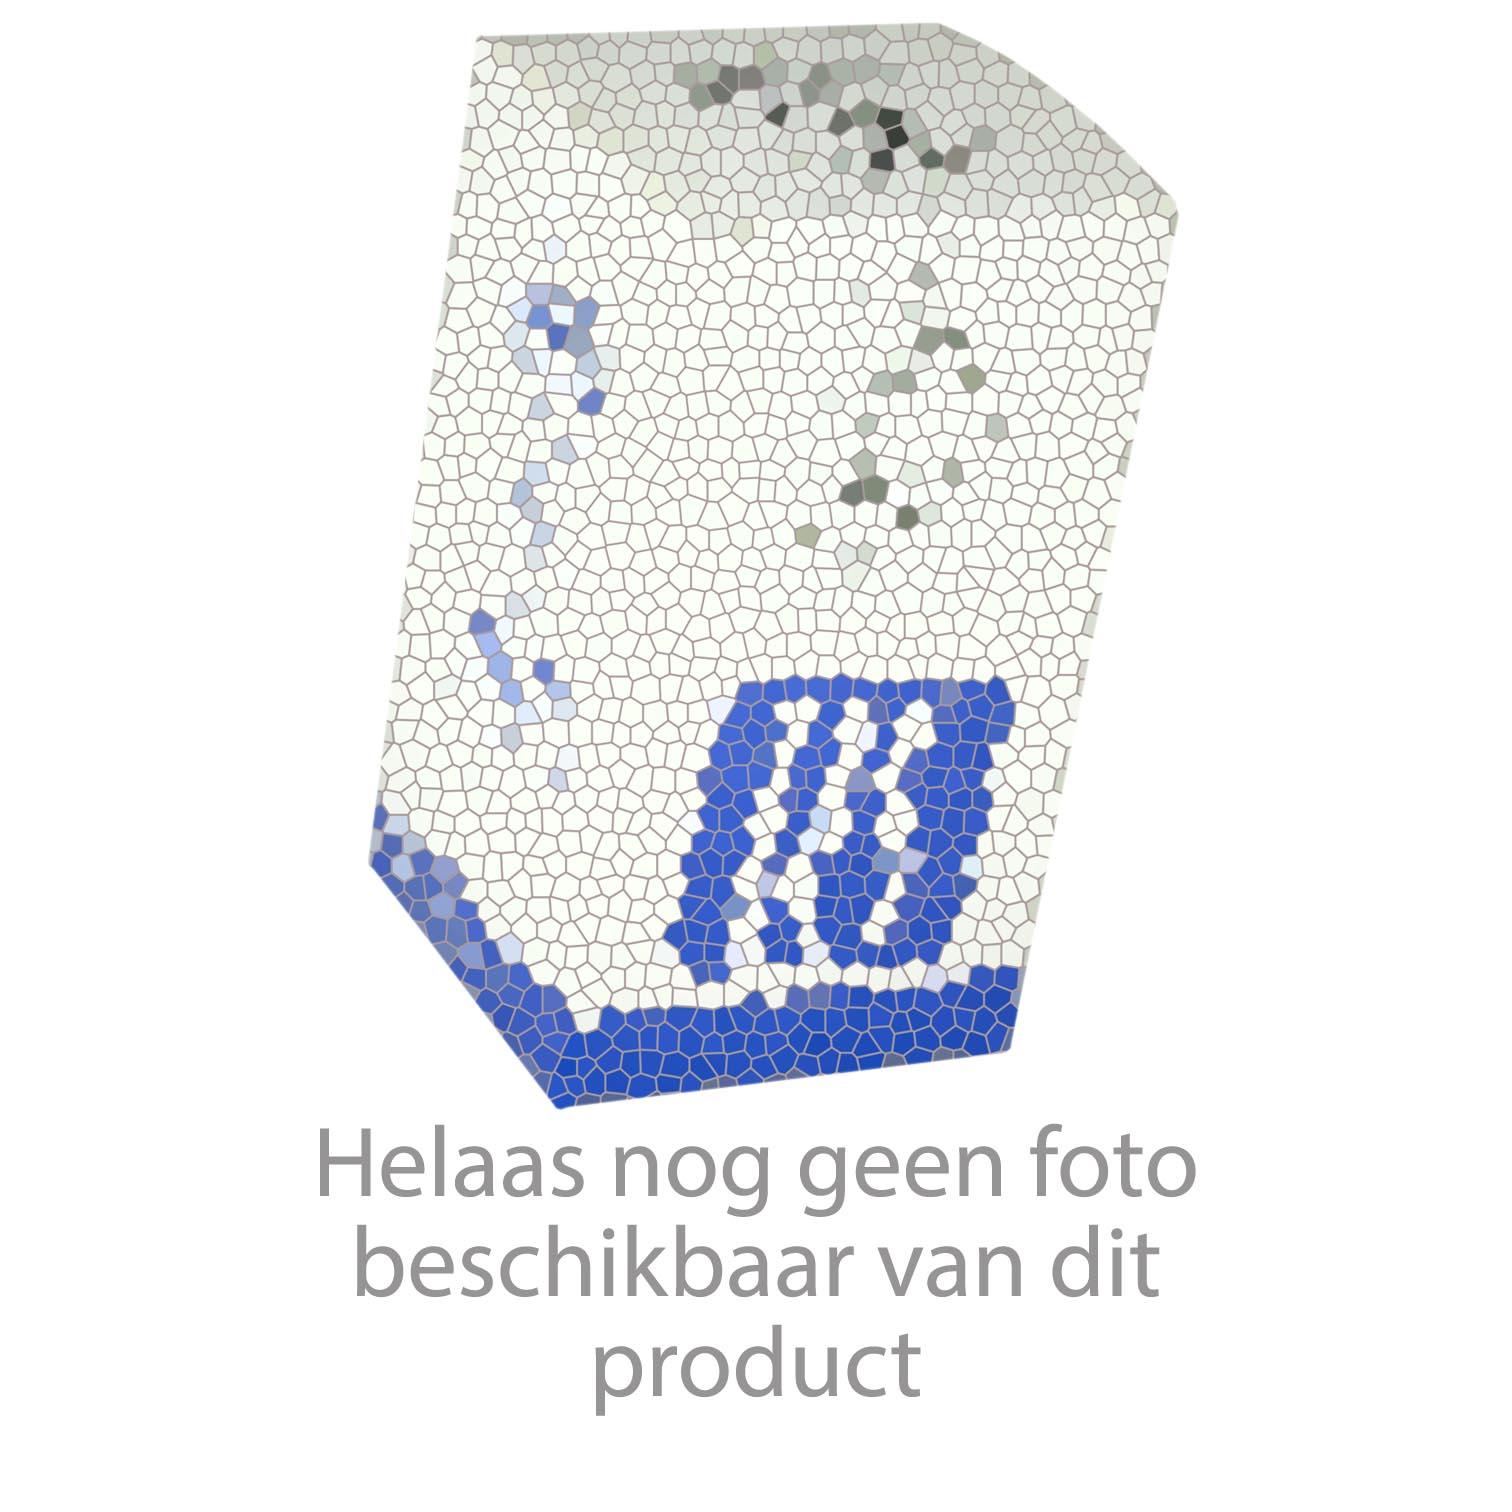 Grohe onderdelen Allure Brilliant Wastafelmengkraan Hoog Gladde Body 23112000